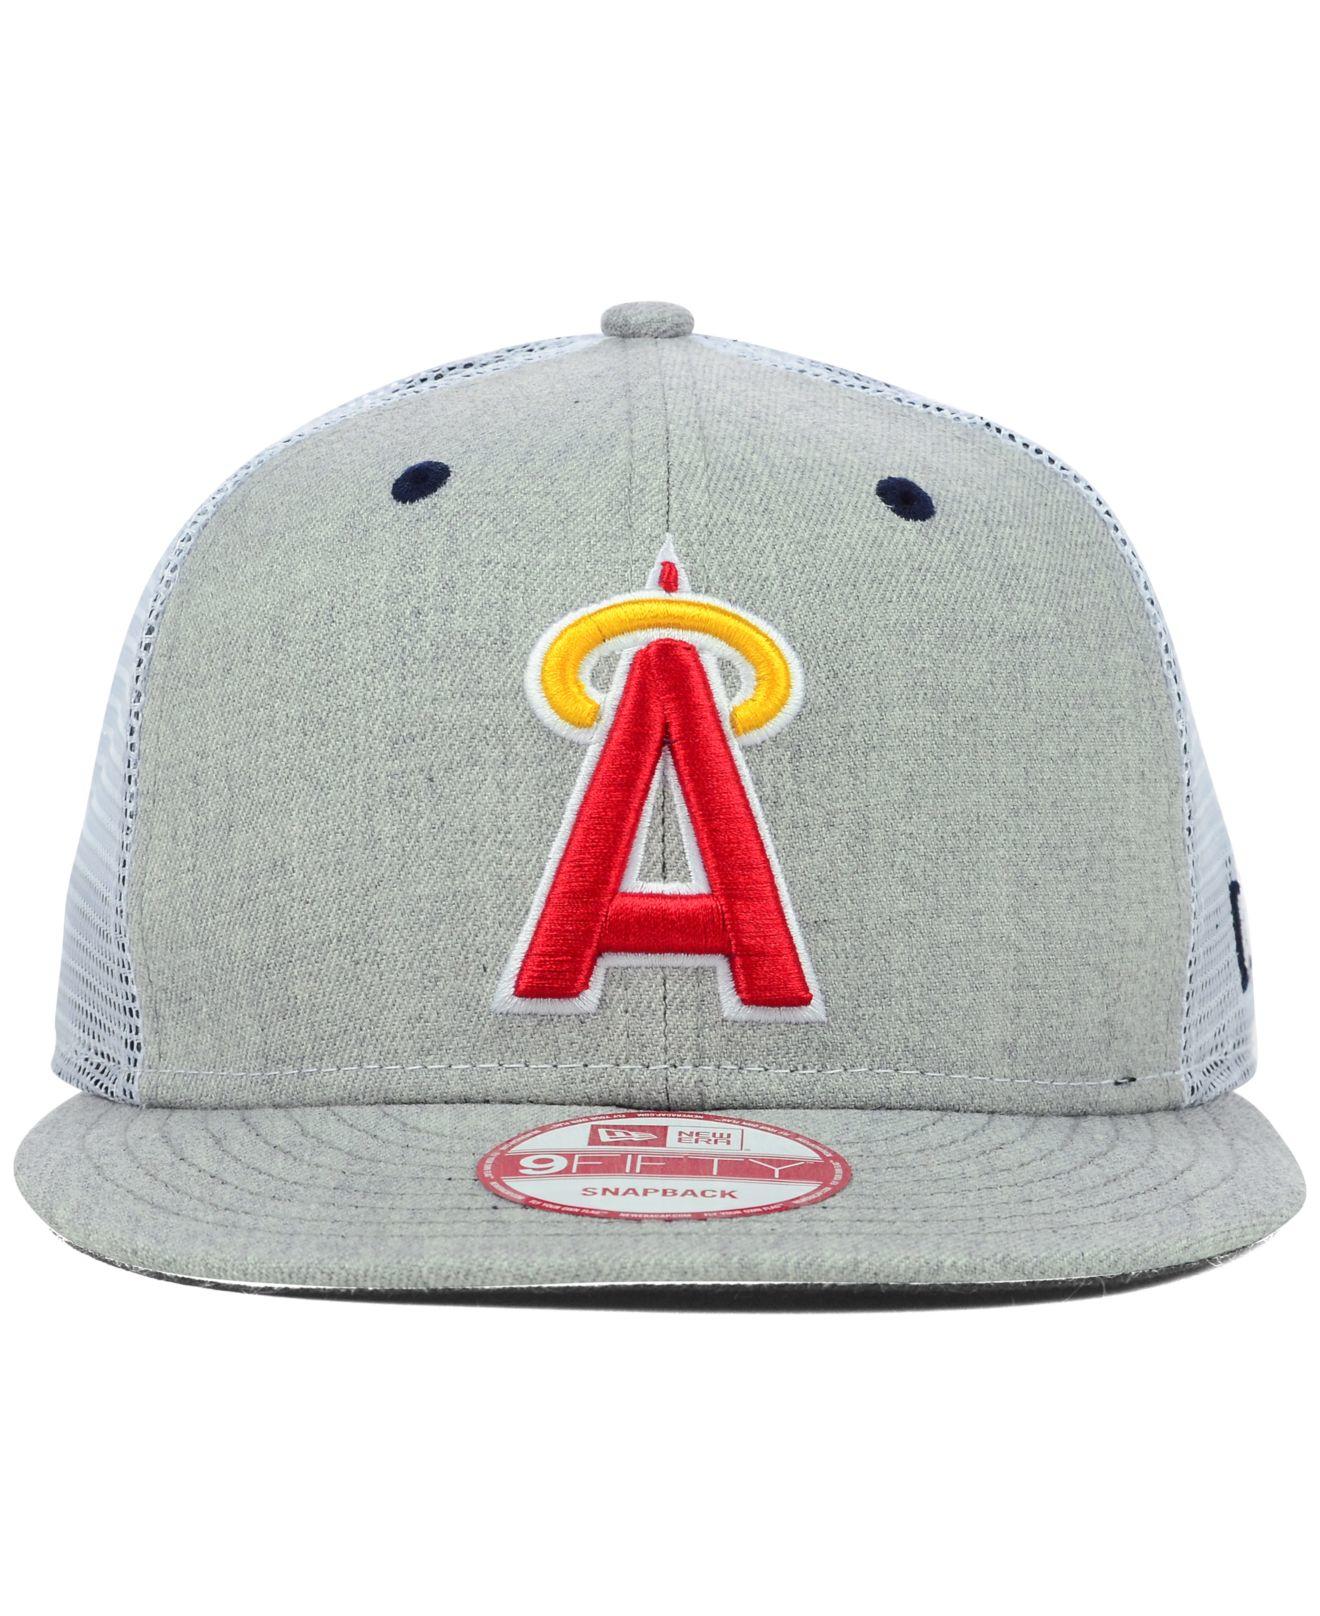 326eae0b2a8 Lyst - KTZ Los Angeles Angels Of Anaheim Heather Trucker 9fifty ...